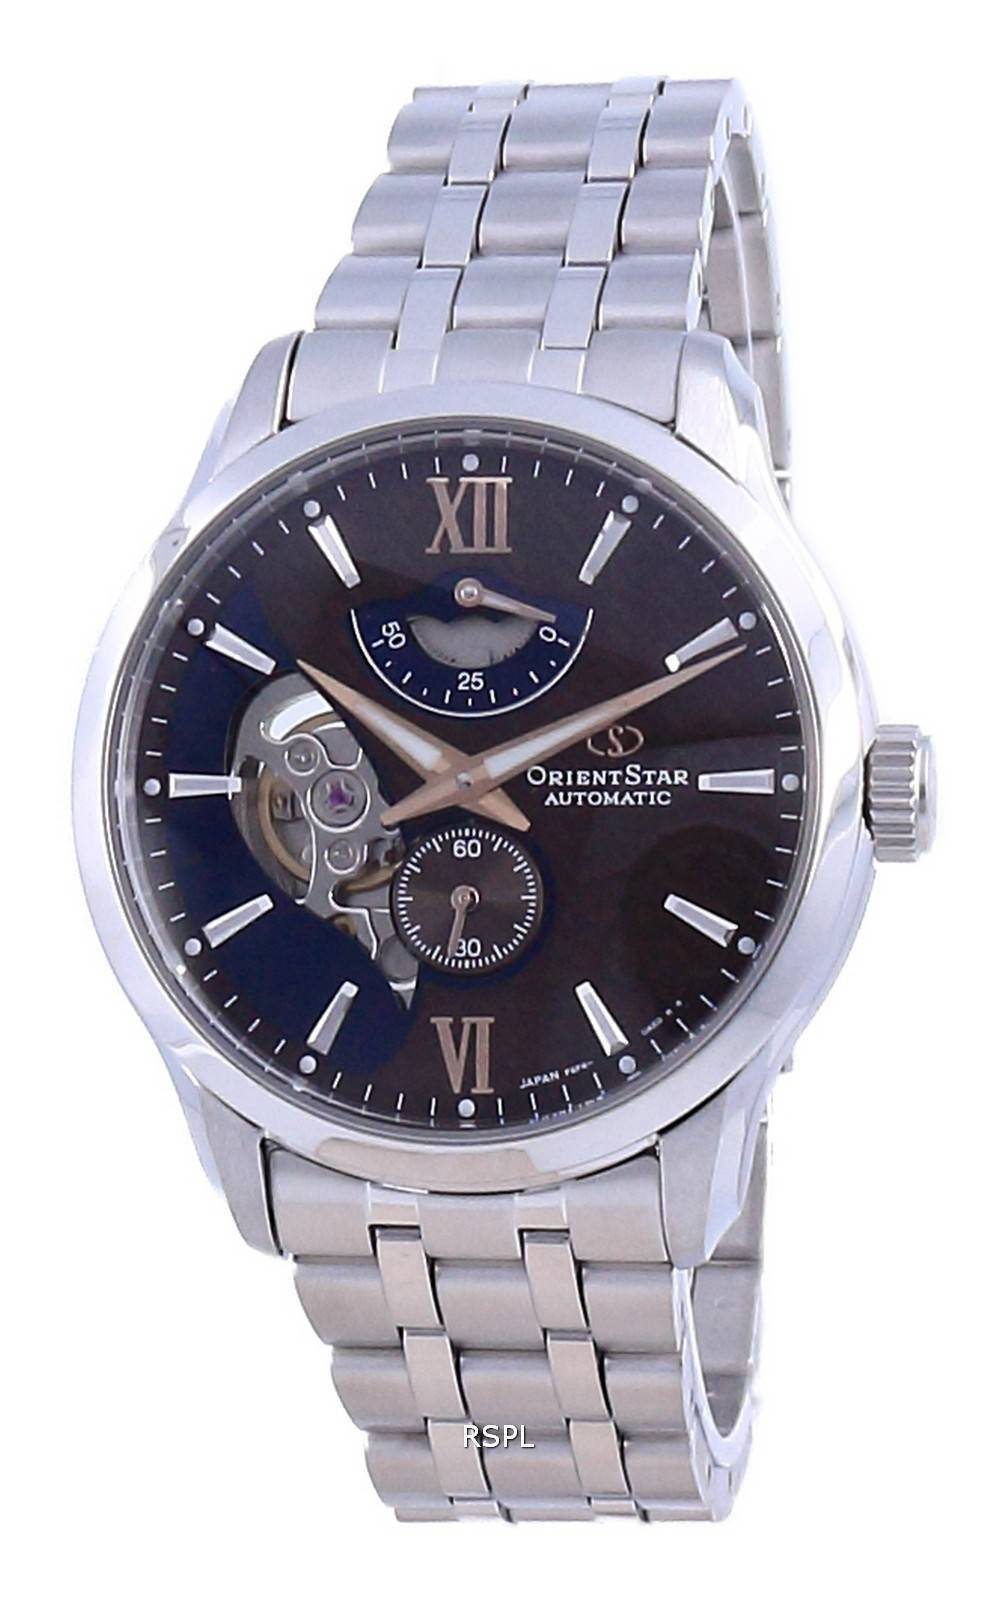 Orient Star Contemporary avoin sydän automaattinen RE-AV0B02Y00B 100M naisten kello